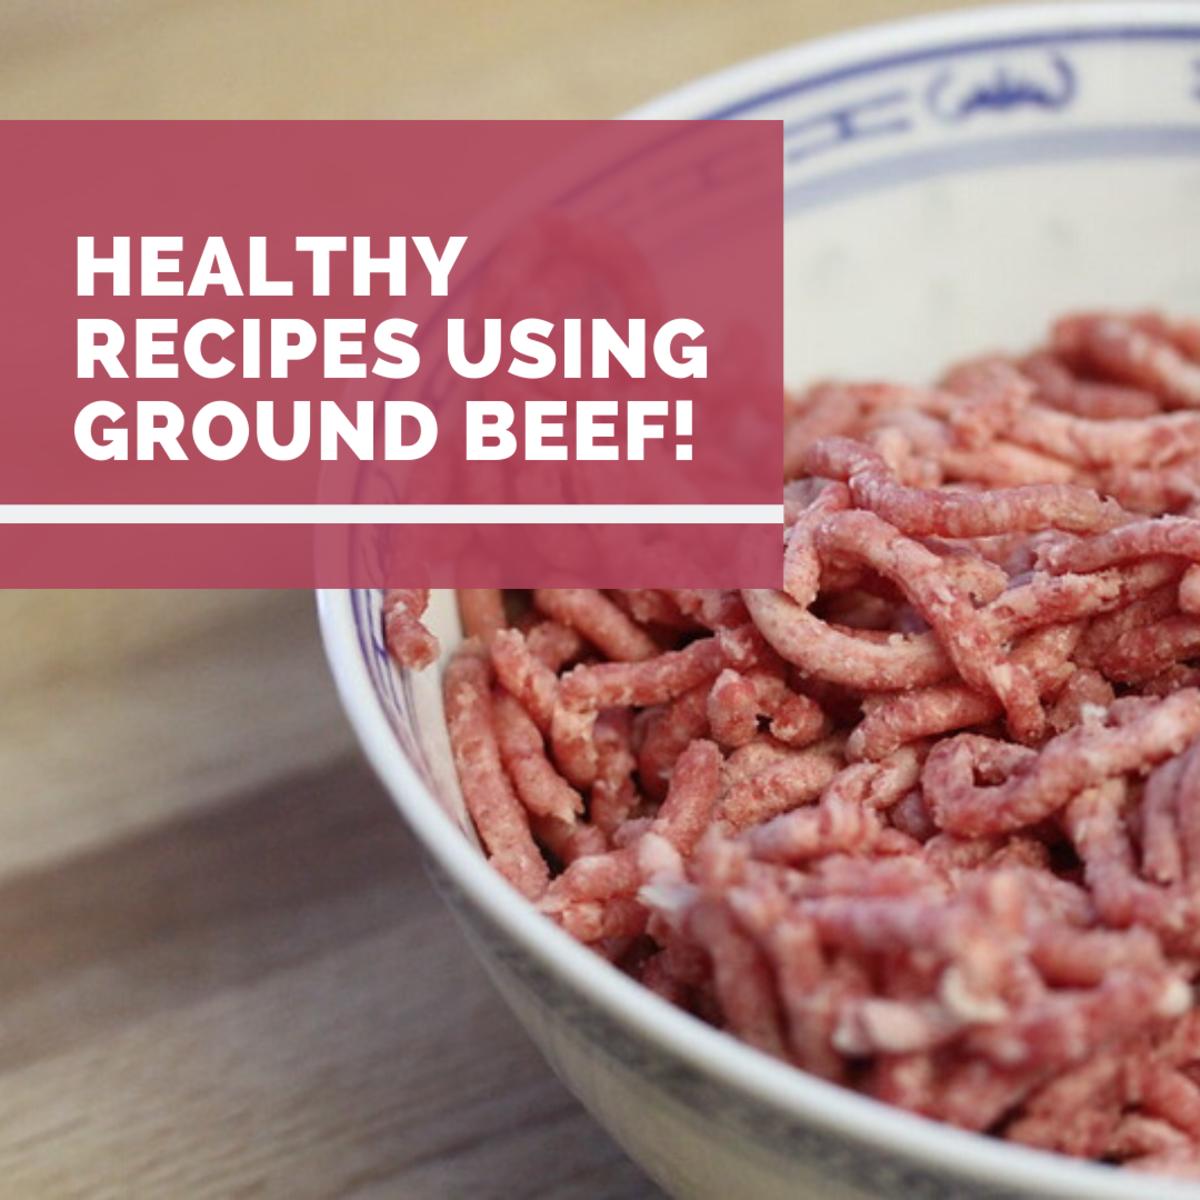 Raw ground beef